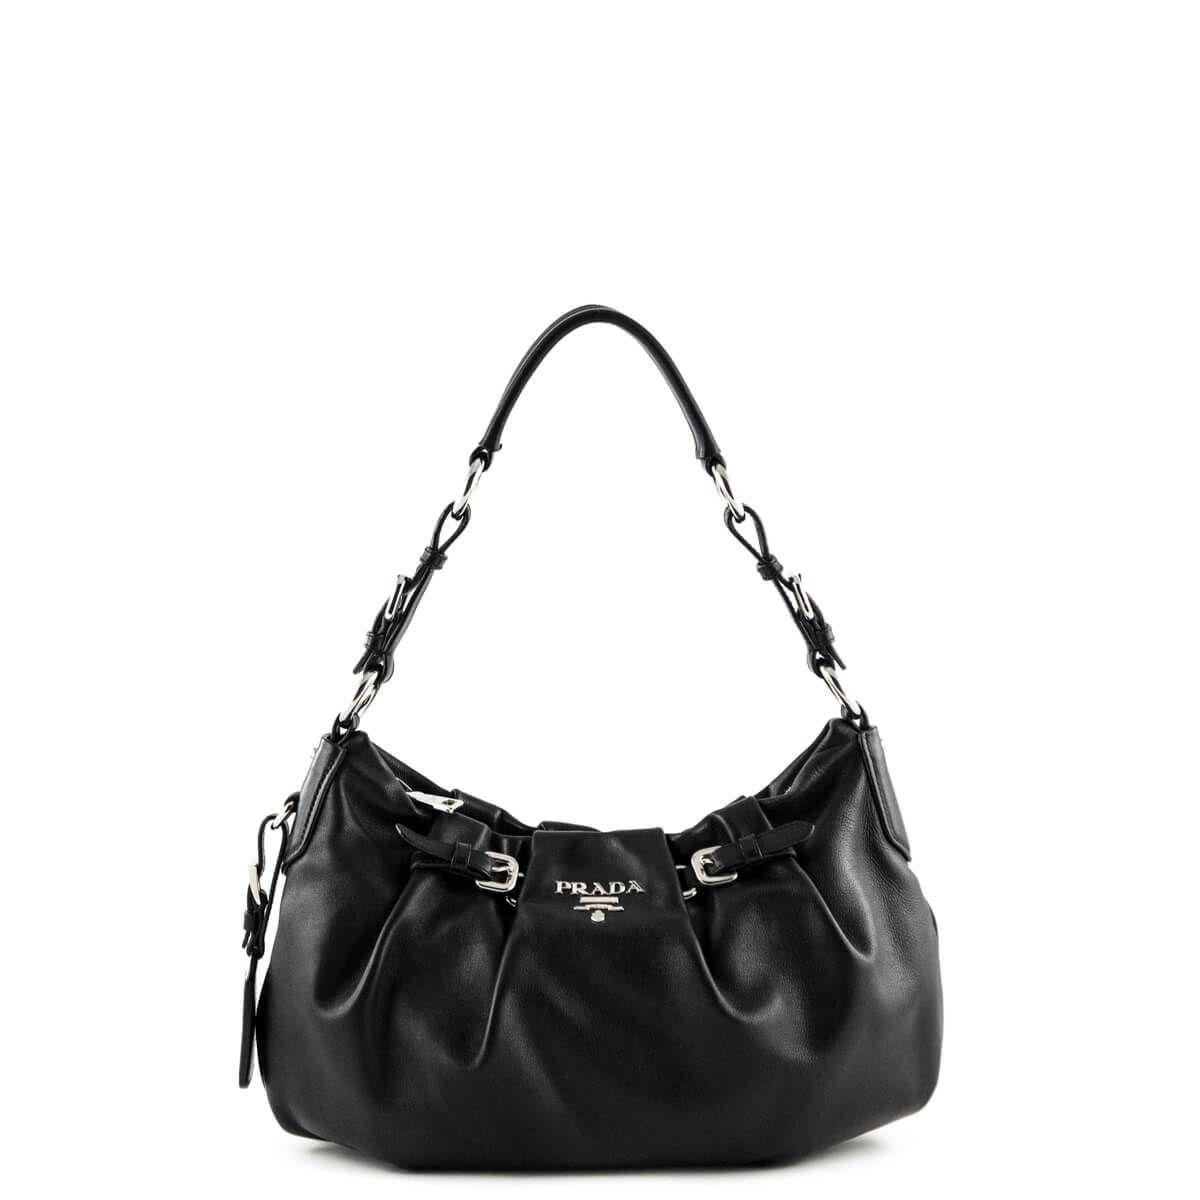 ceac494cfcf5 Prada Black Vitello Daino Hobo - LOVE that BAG - Preowned Authentic  Designer Handbags -  650